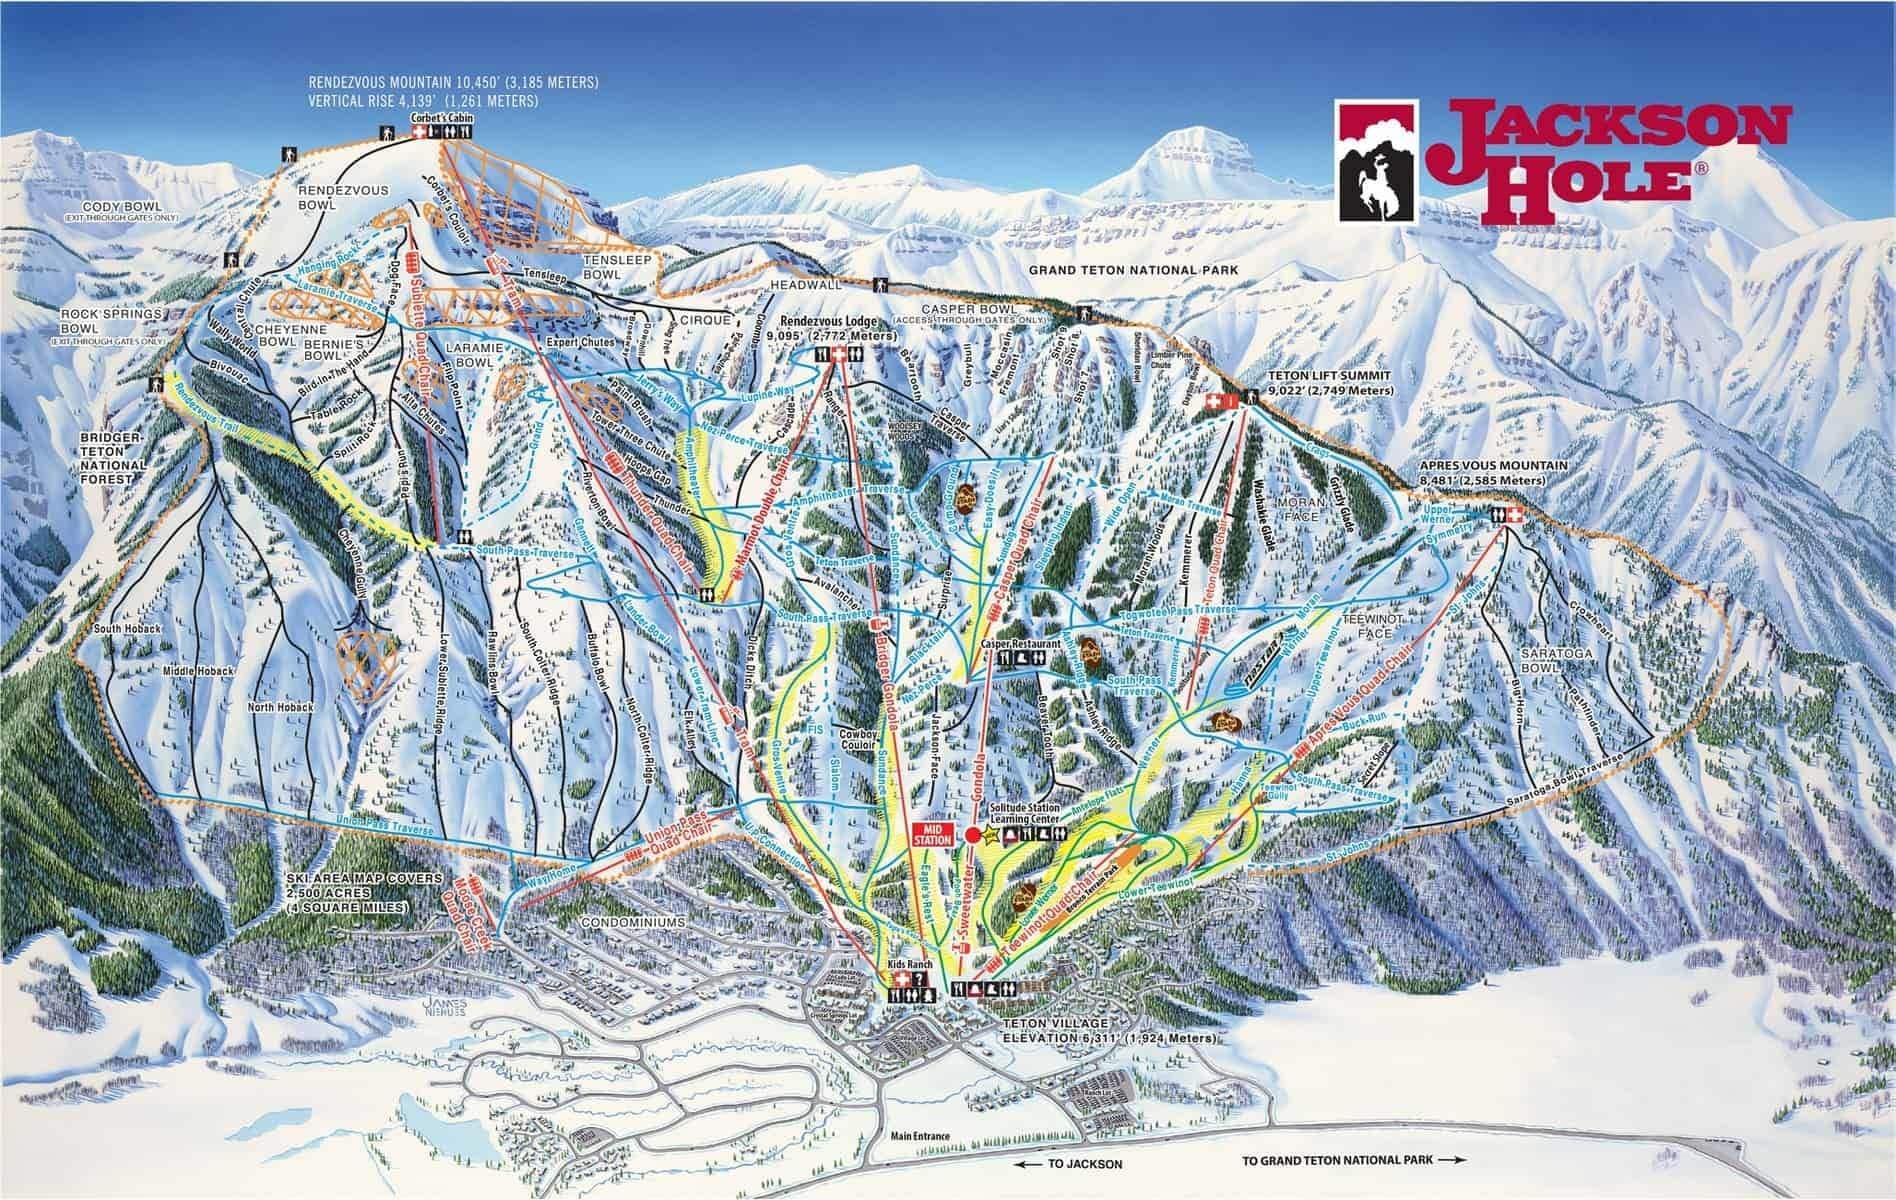 Jackson Hole, piste map